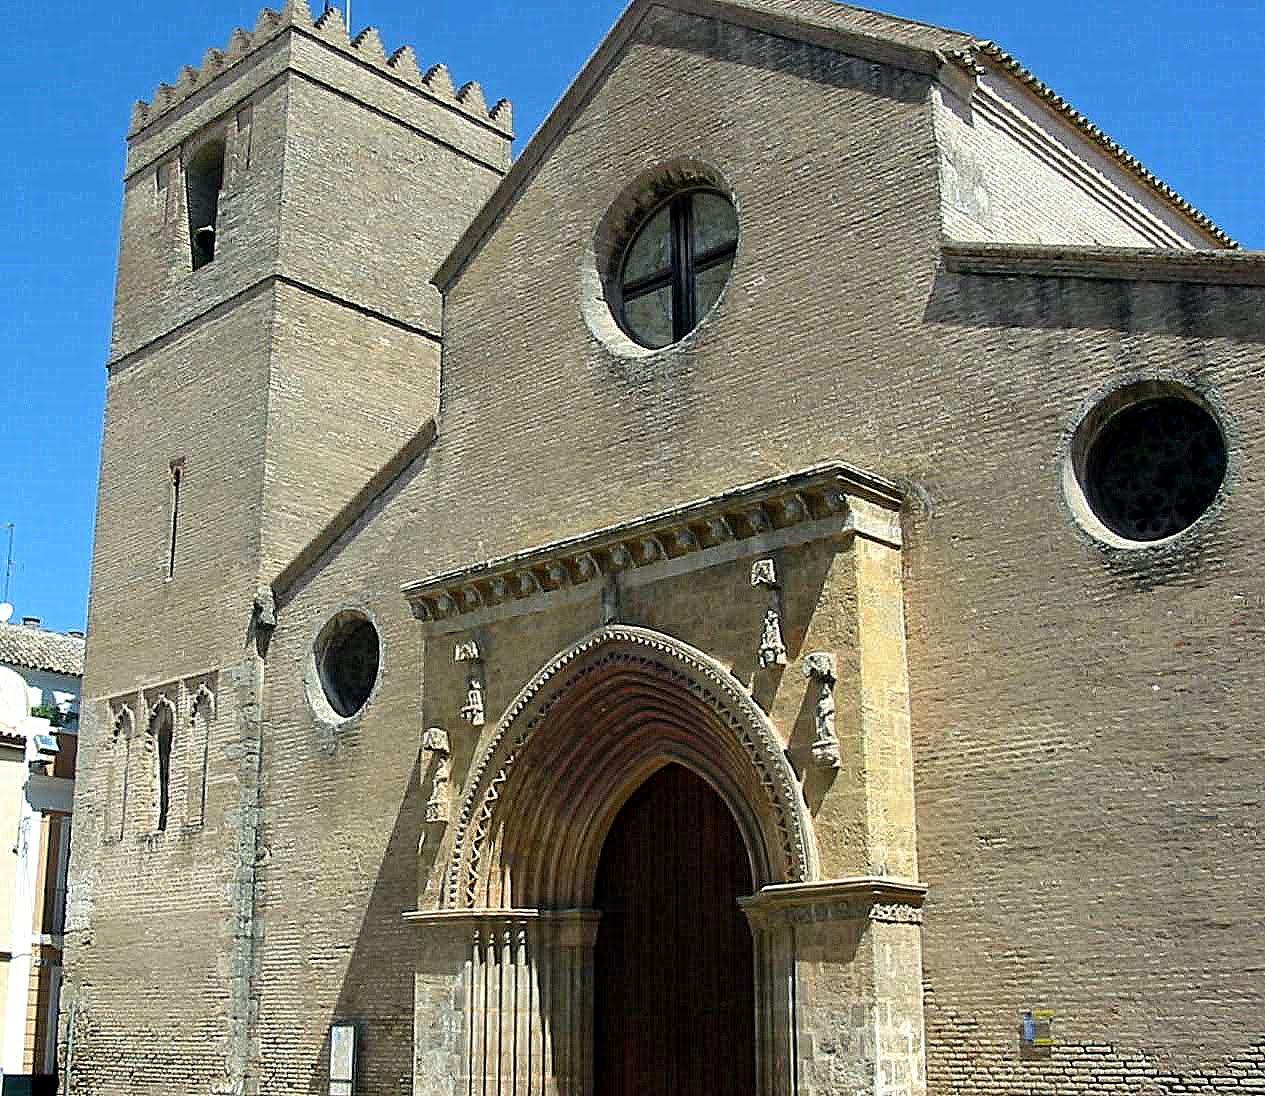 Leyendas de sevilla iglesia de santa marina y san juan for Puerta 8 san marcos